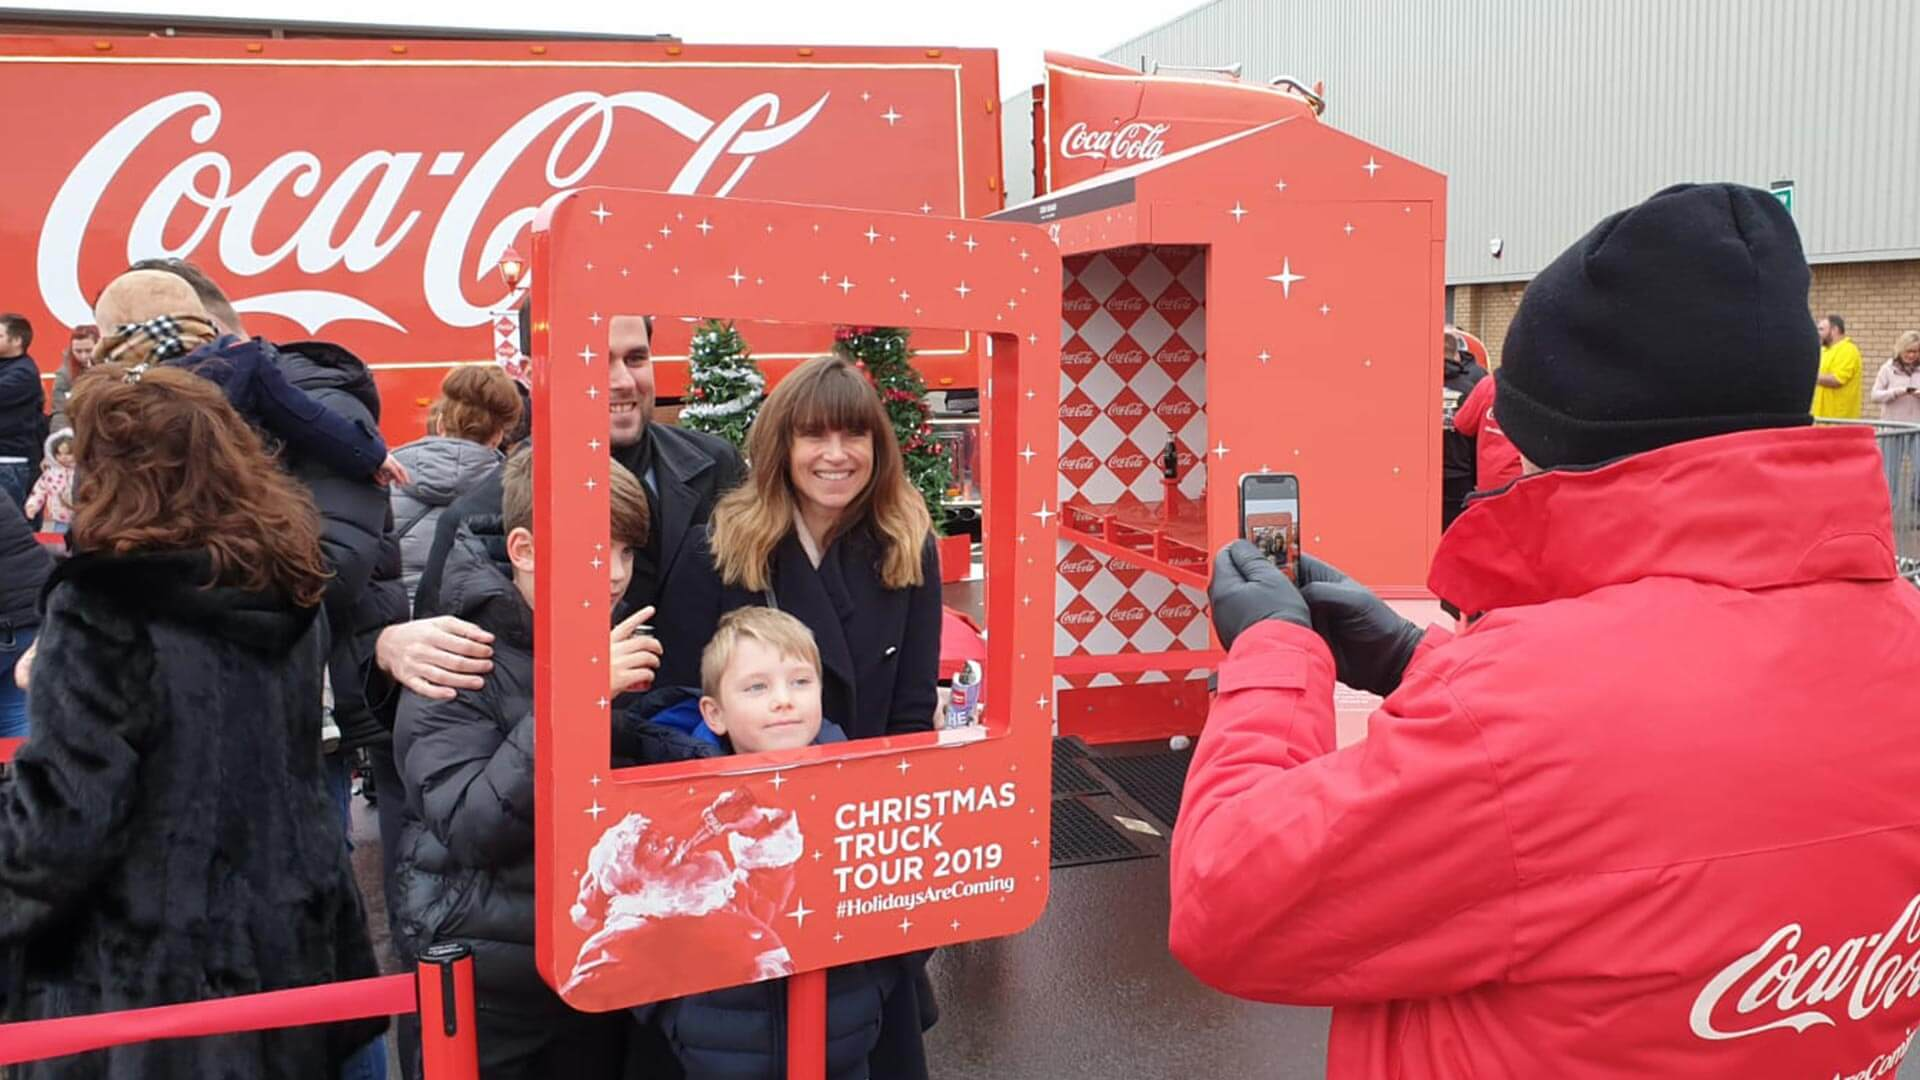 Coke Christmas truck digital amplification